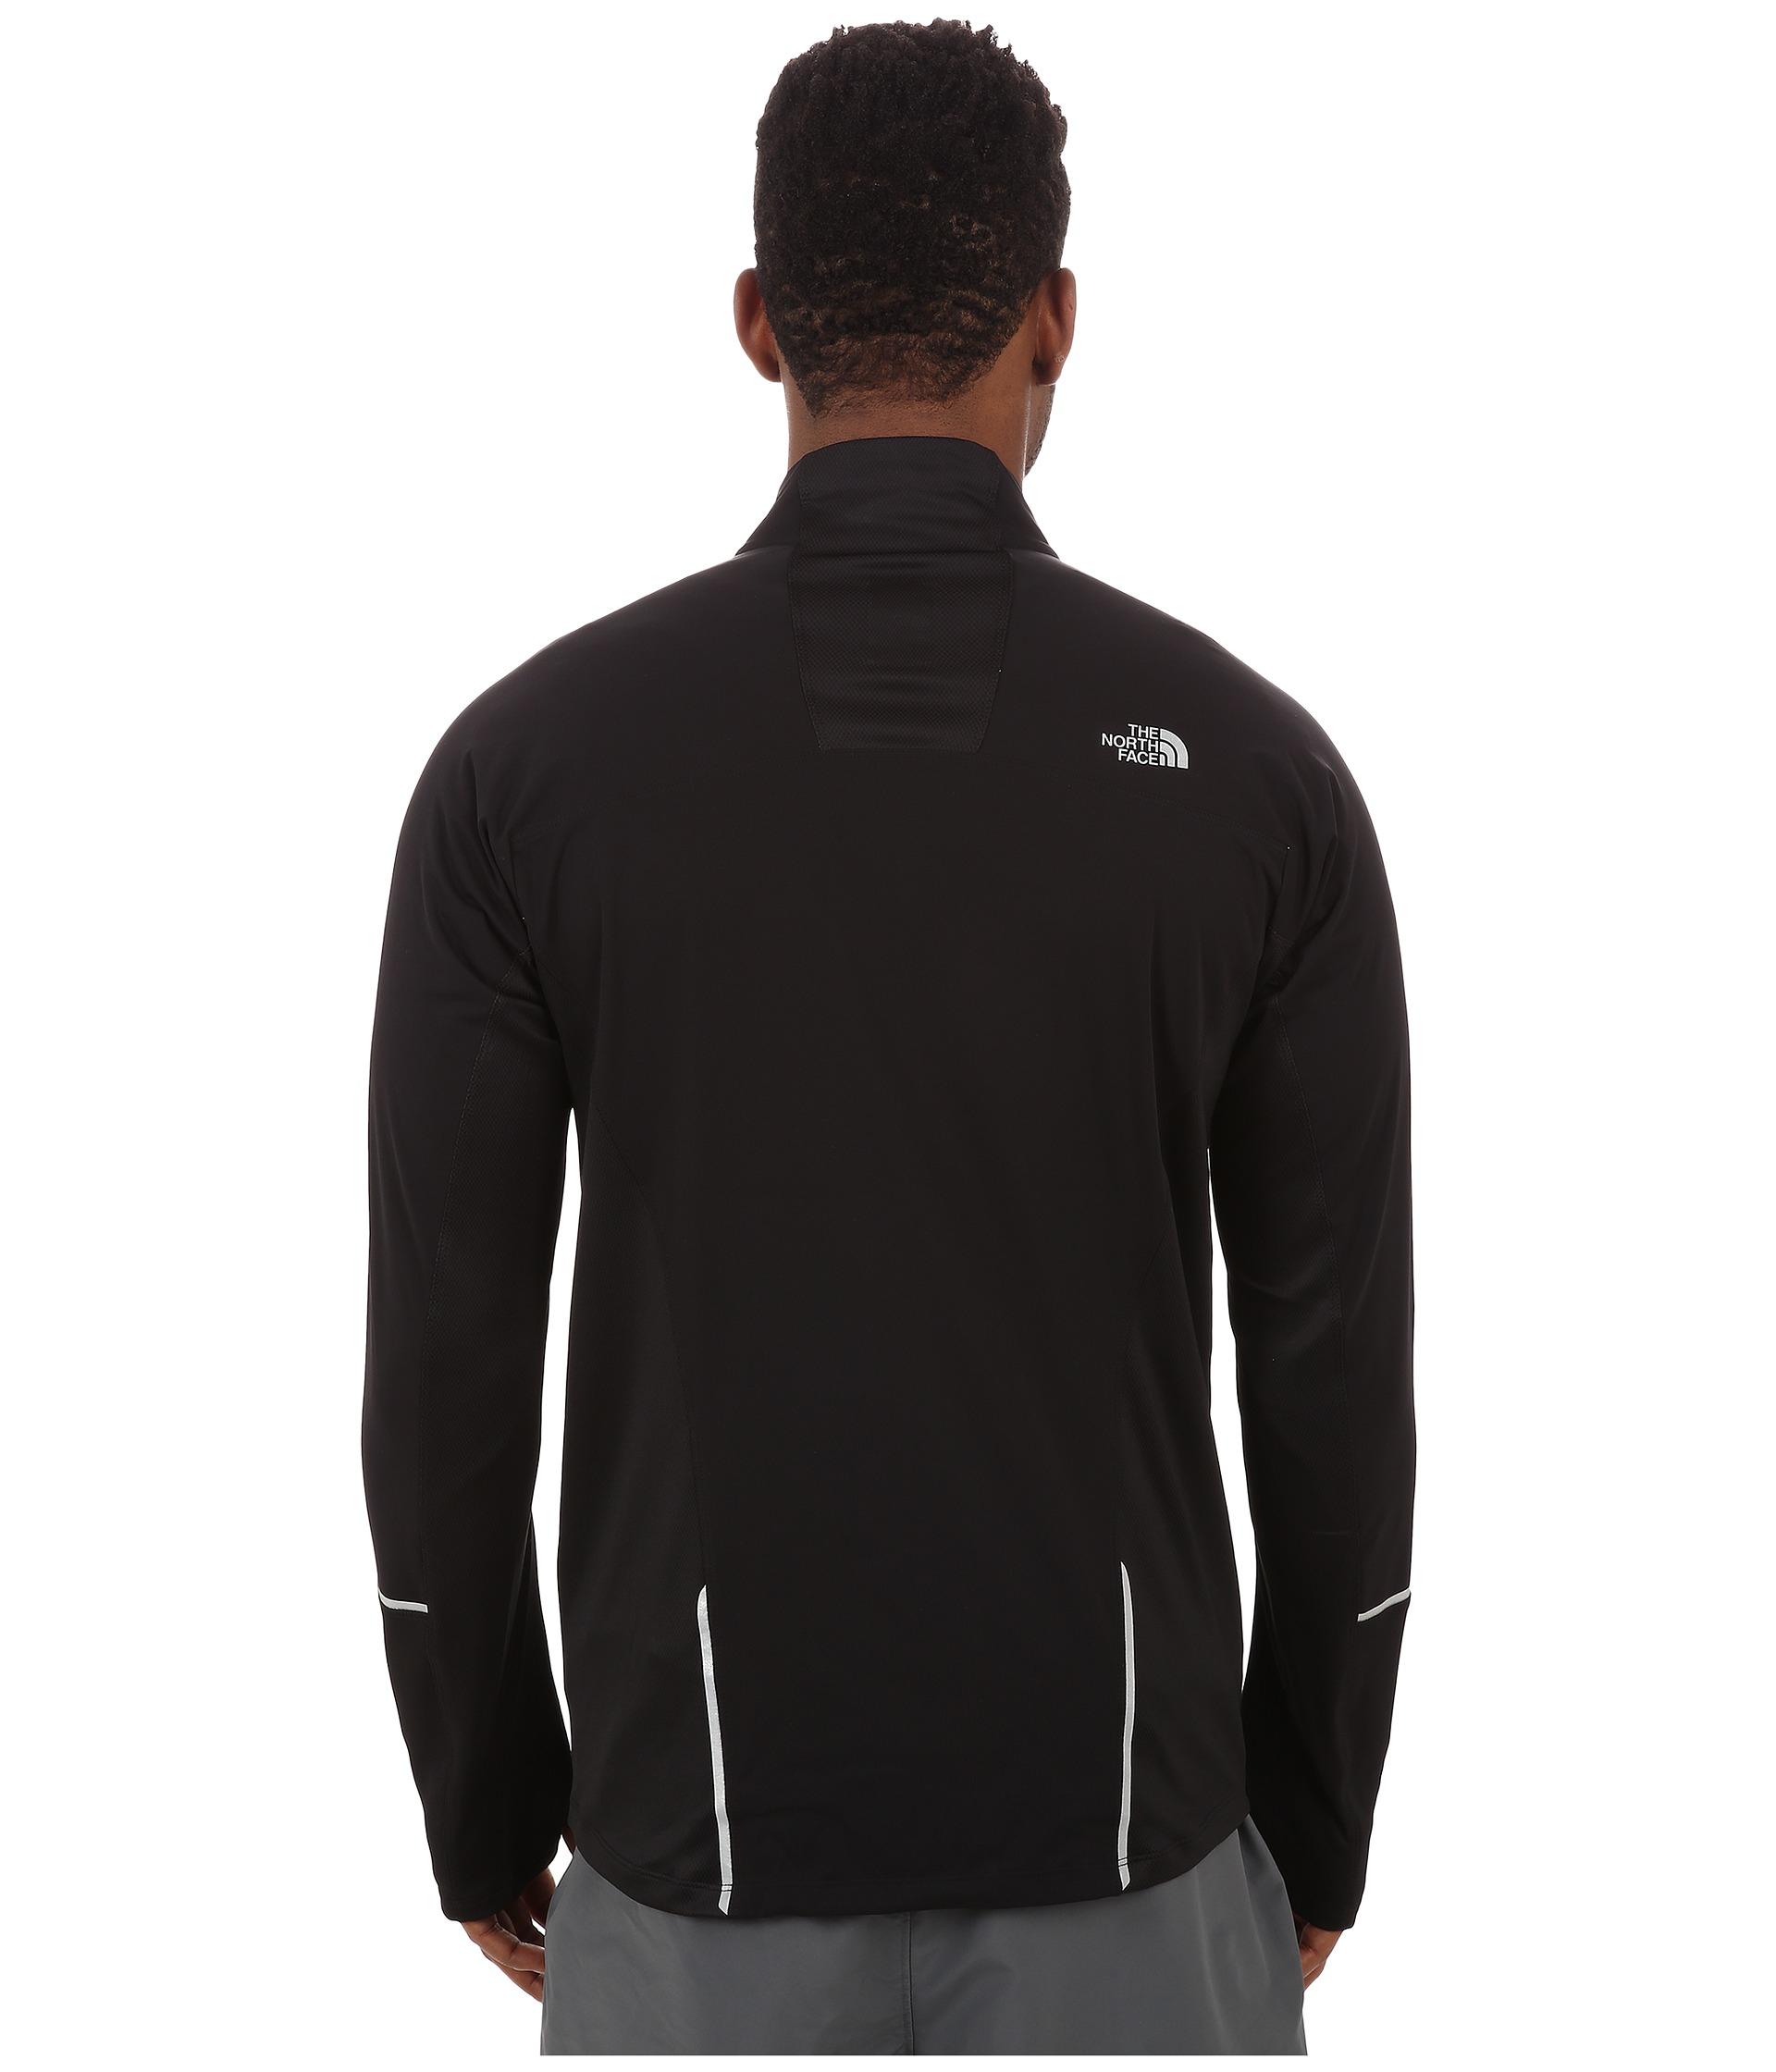 9736d277c Men's Black Isolite Jacket